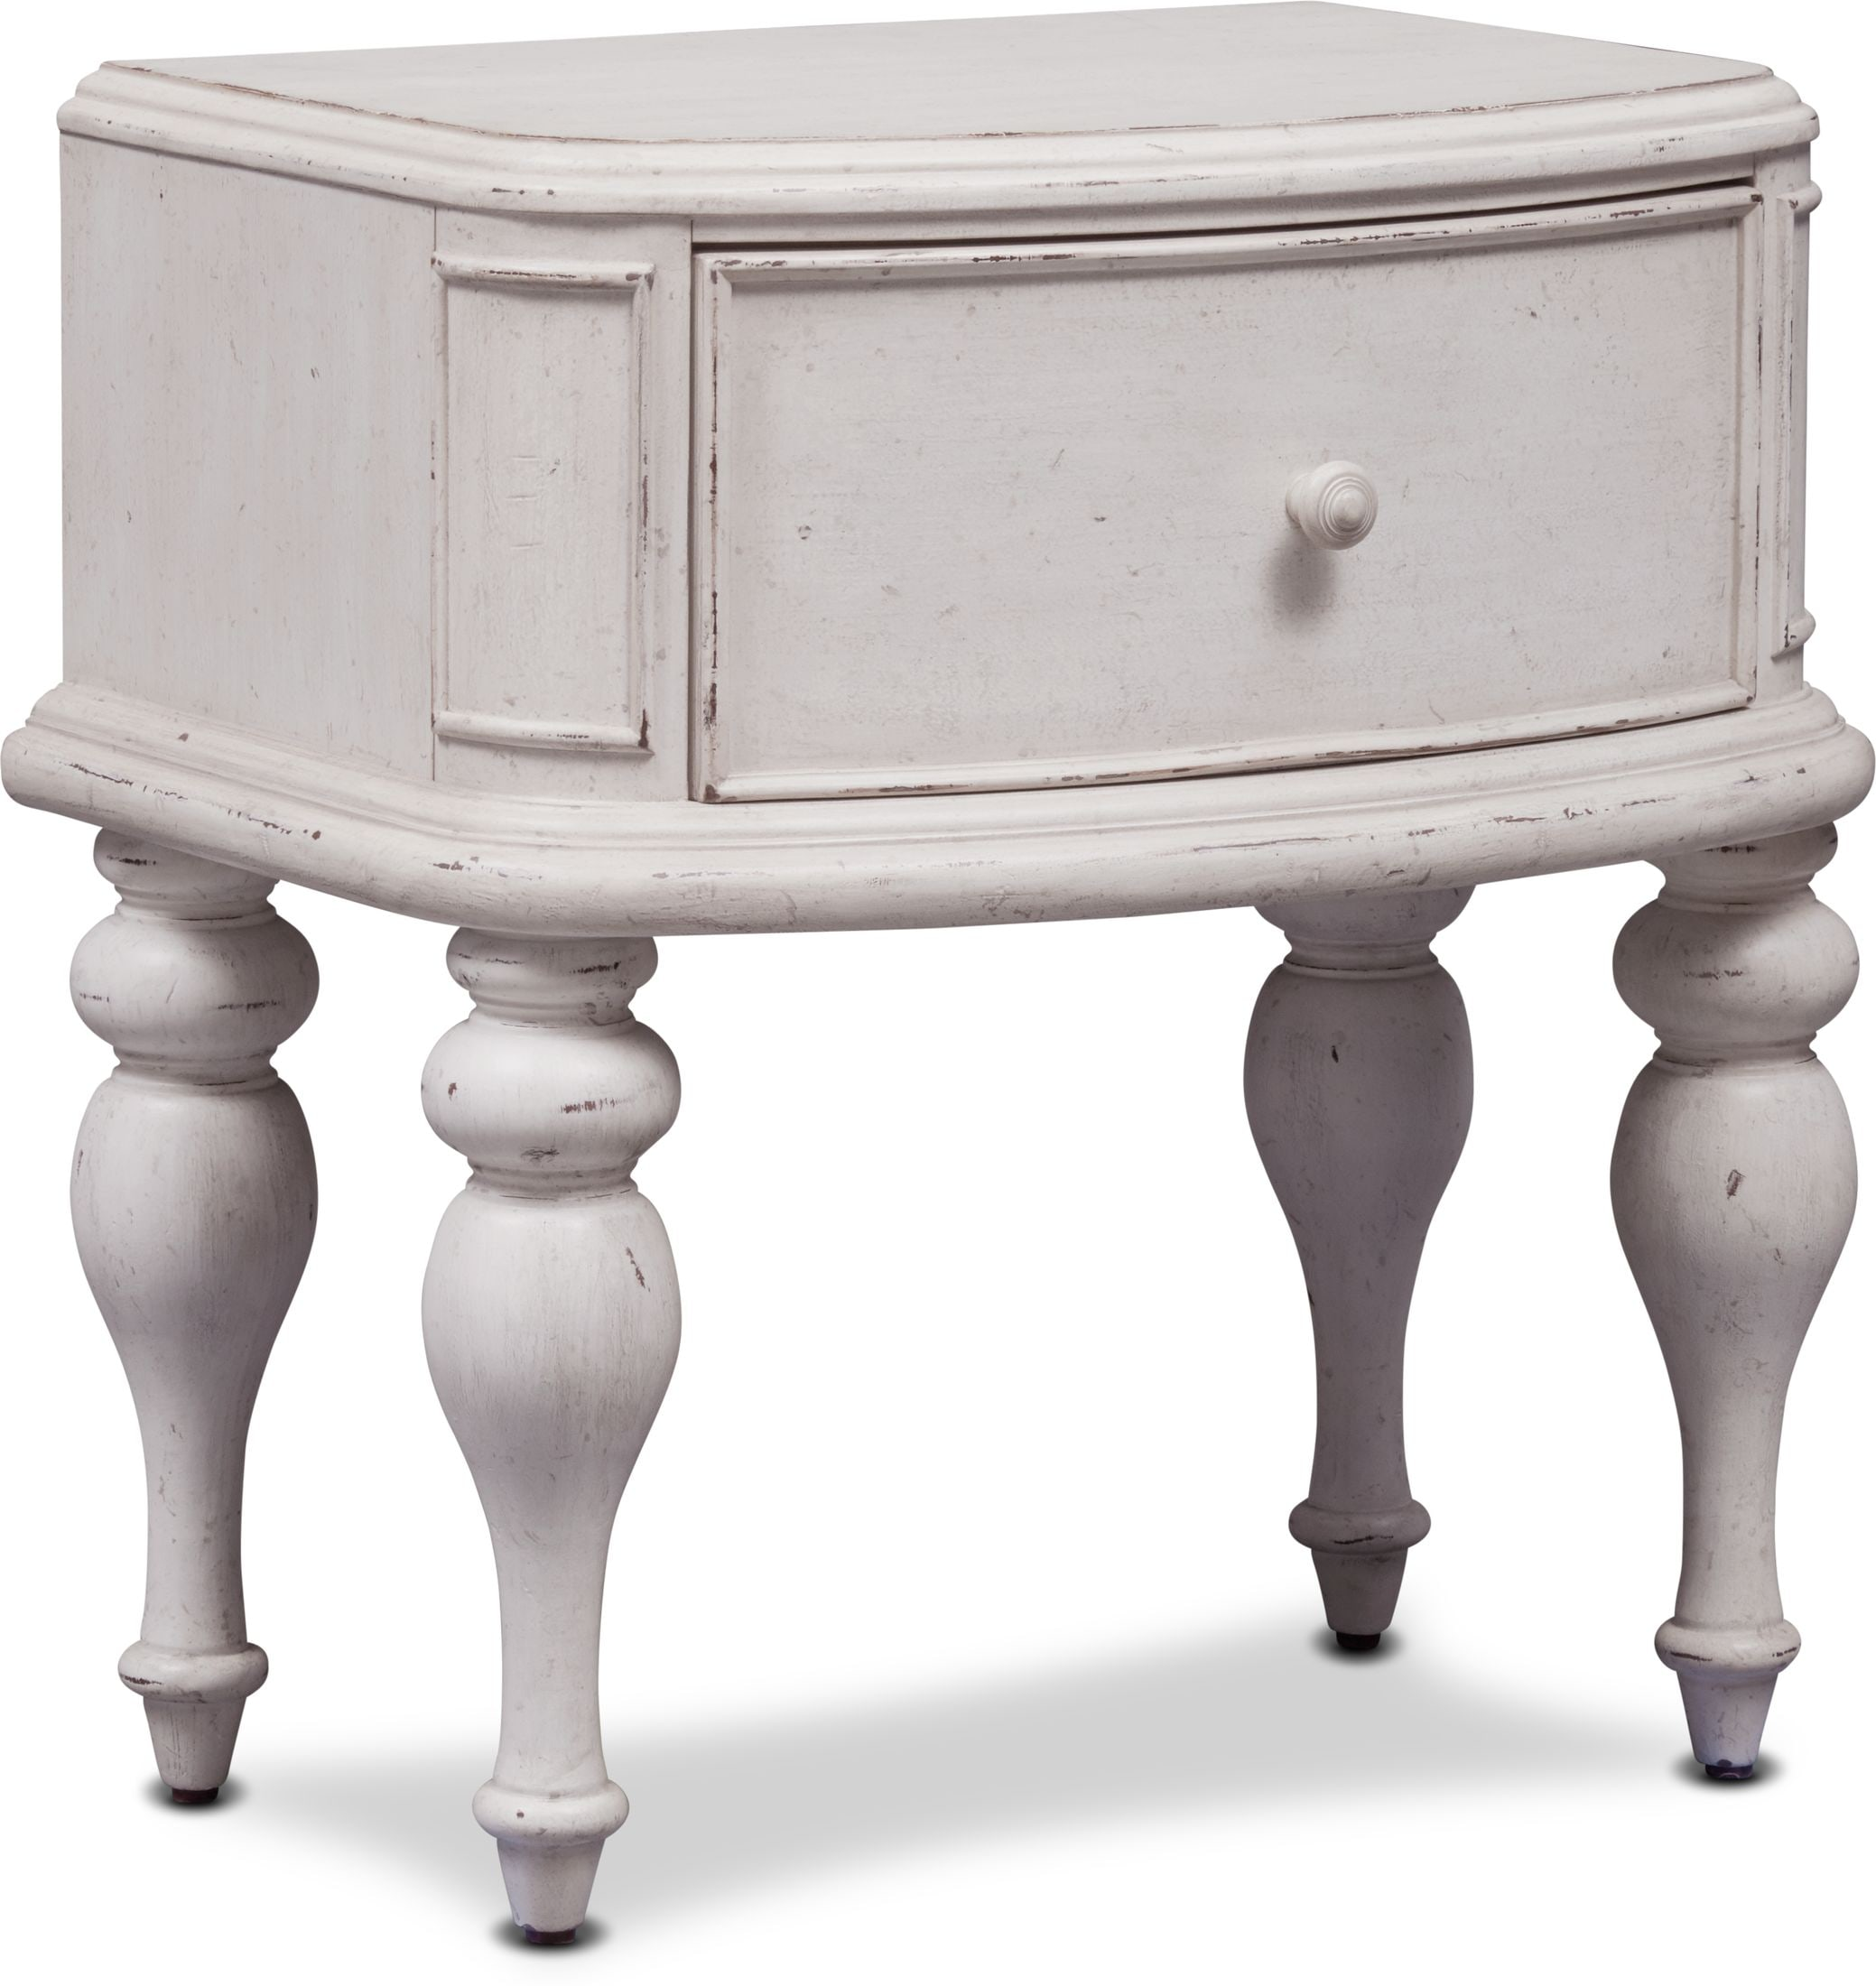 Bedroom Furniture - Florence 1-Drawer Nightstand